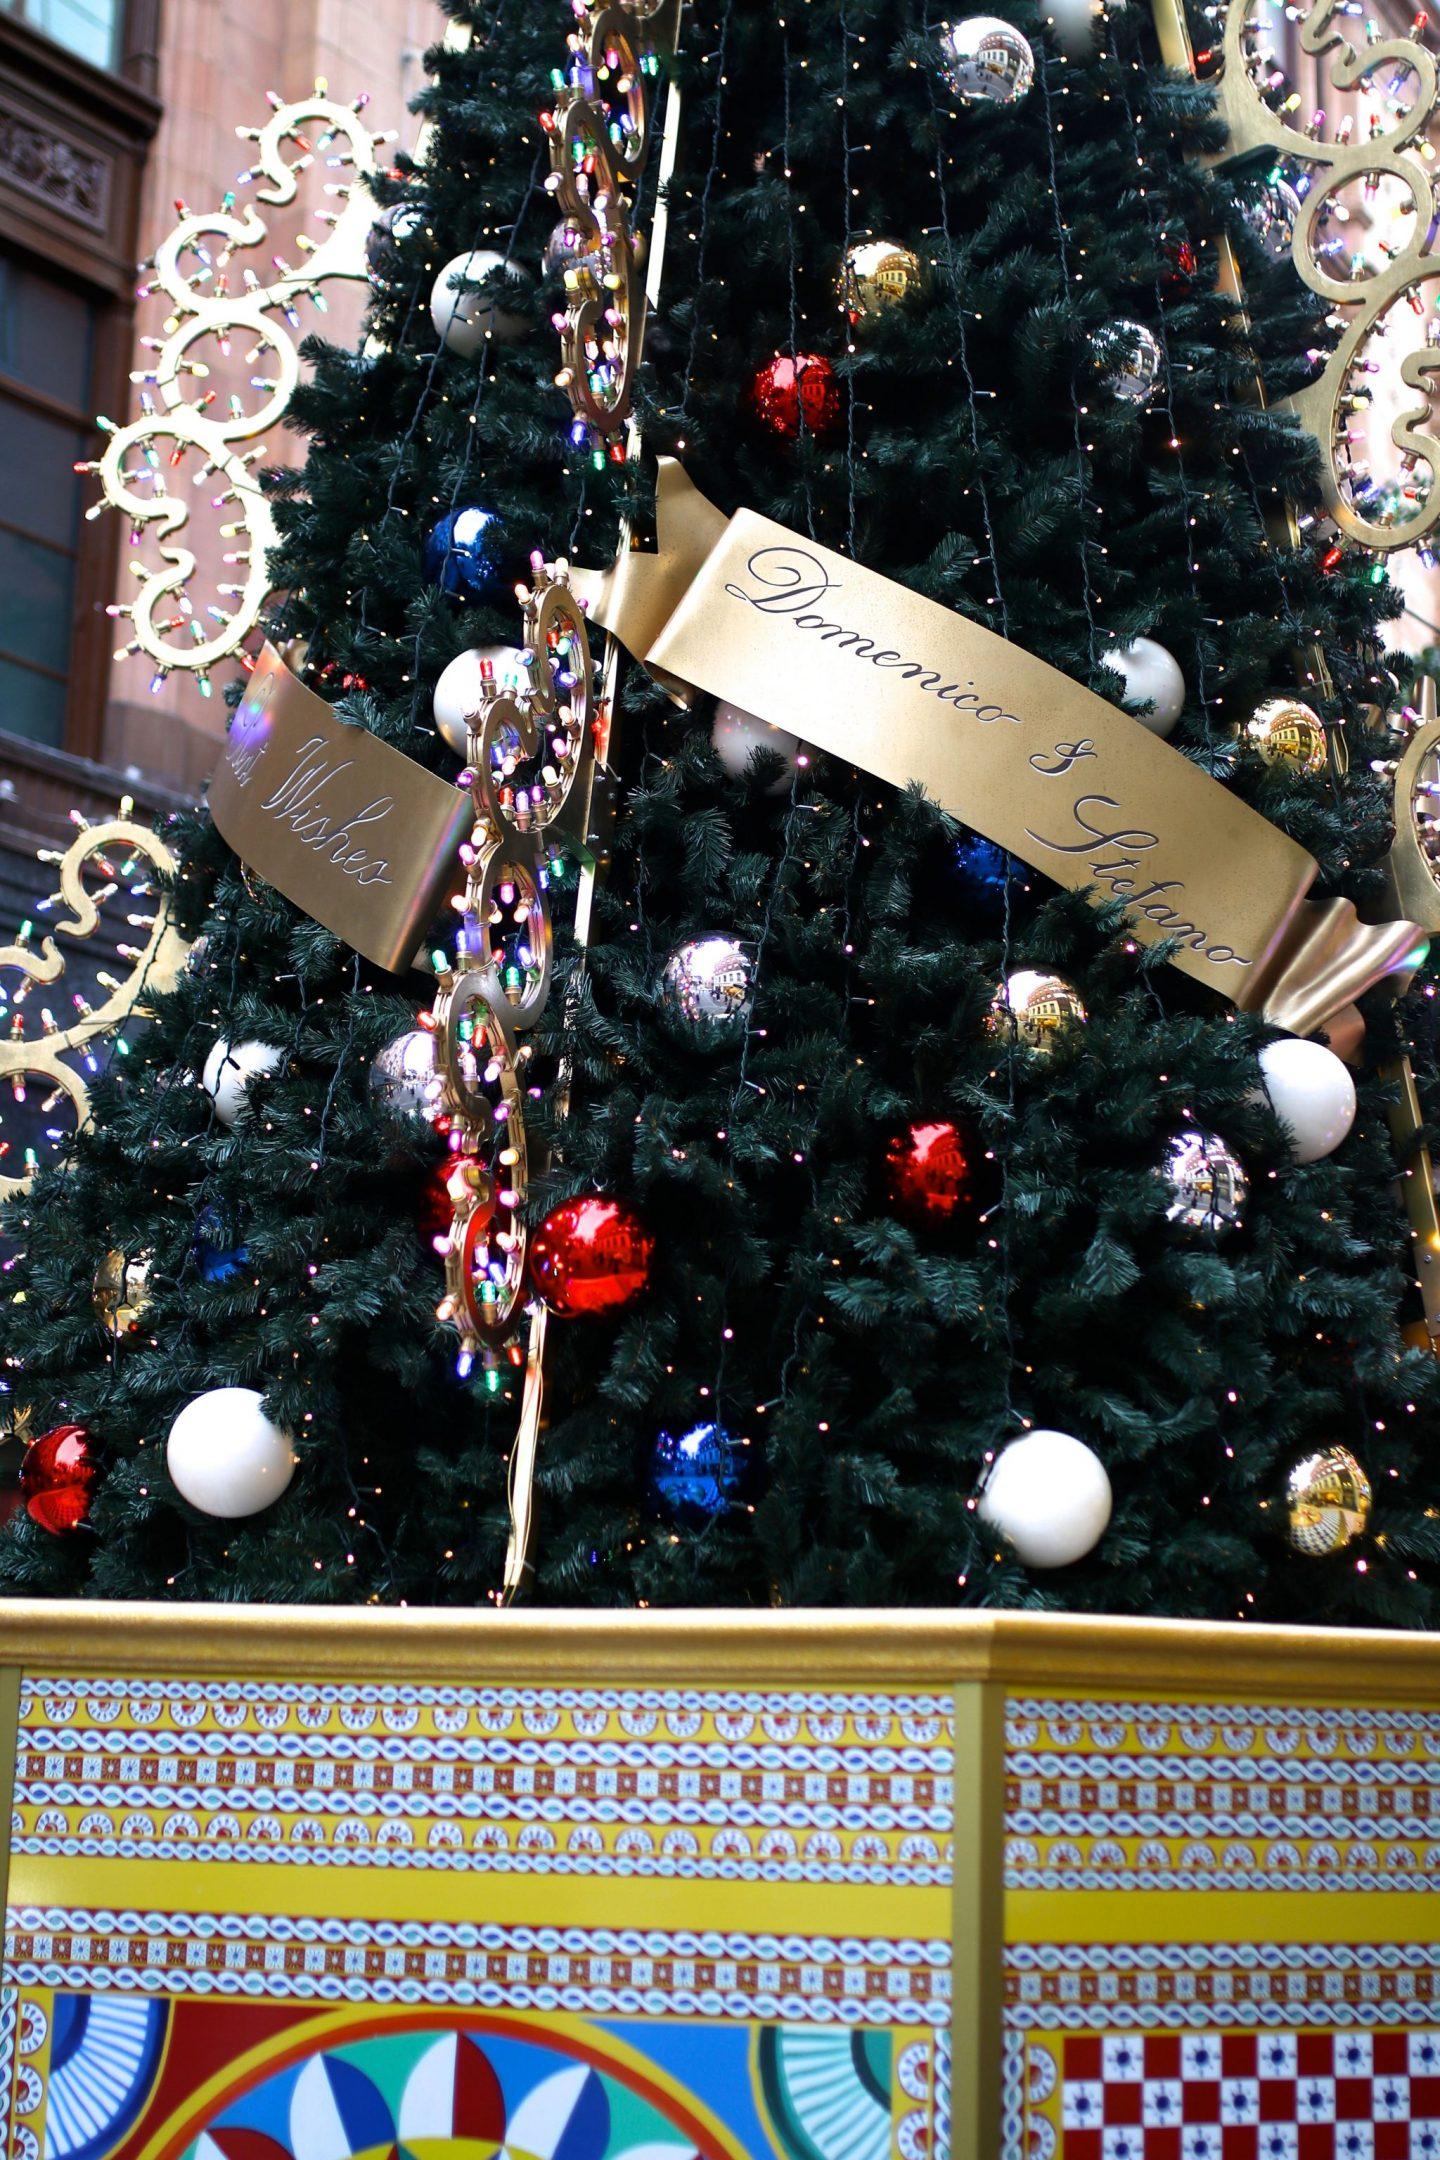 Dolce & Gabbana Christmas Takeover, Katie KALANCHOE